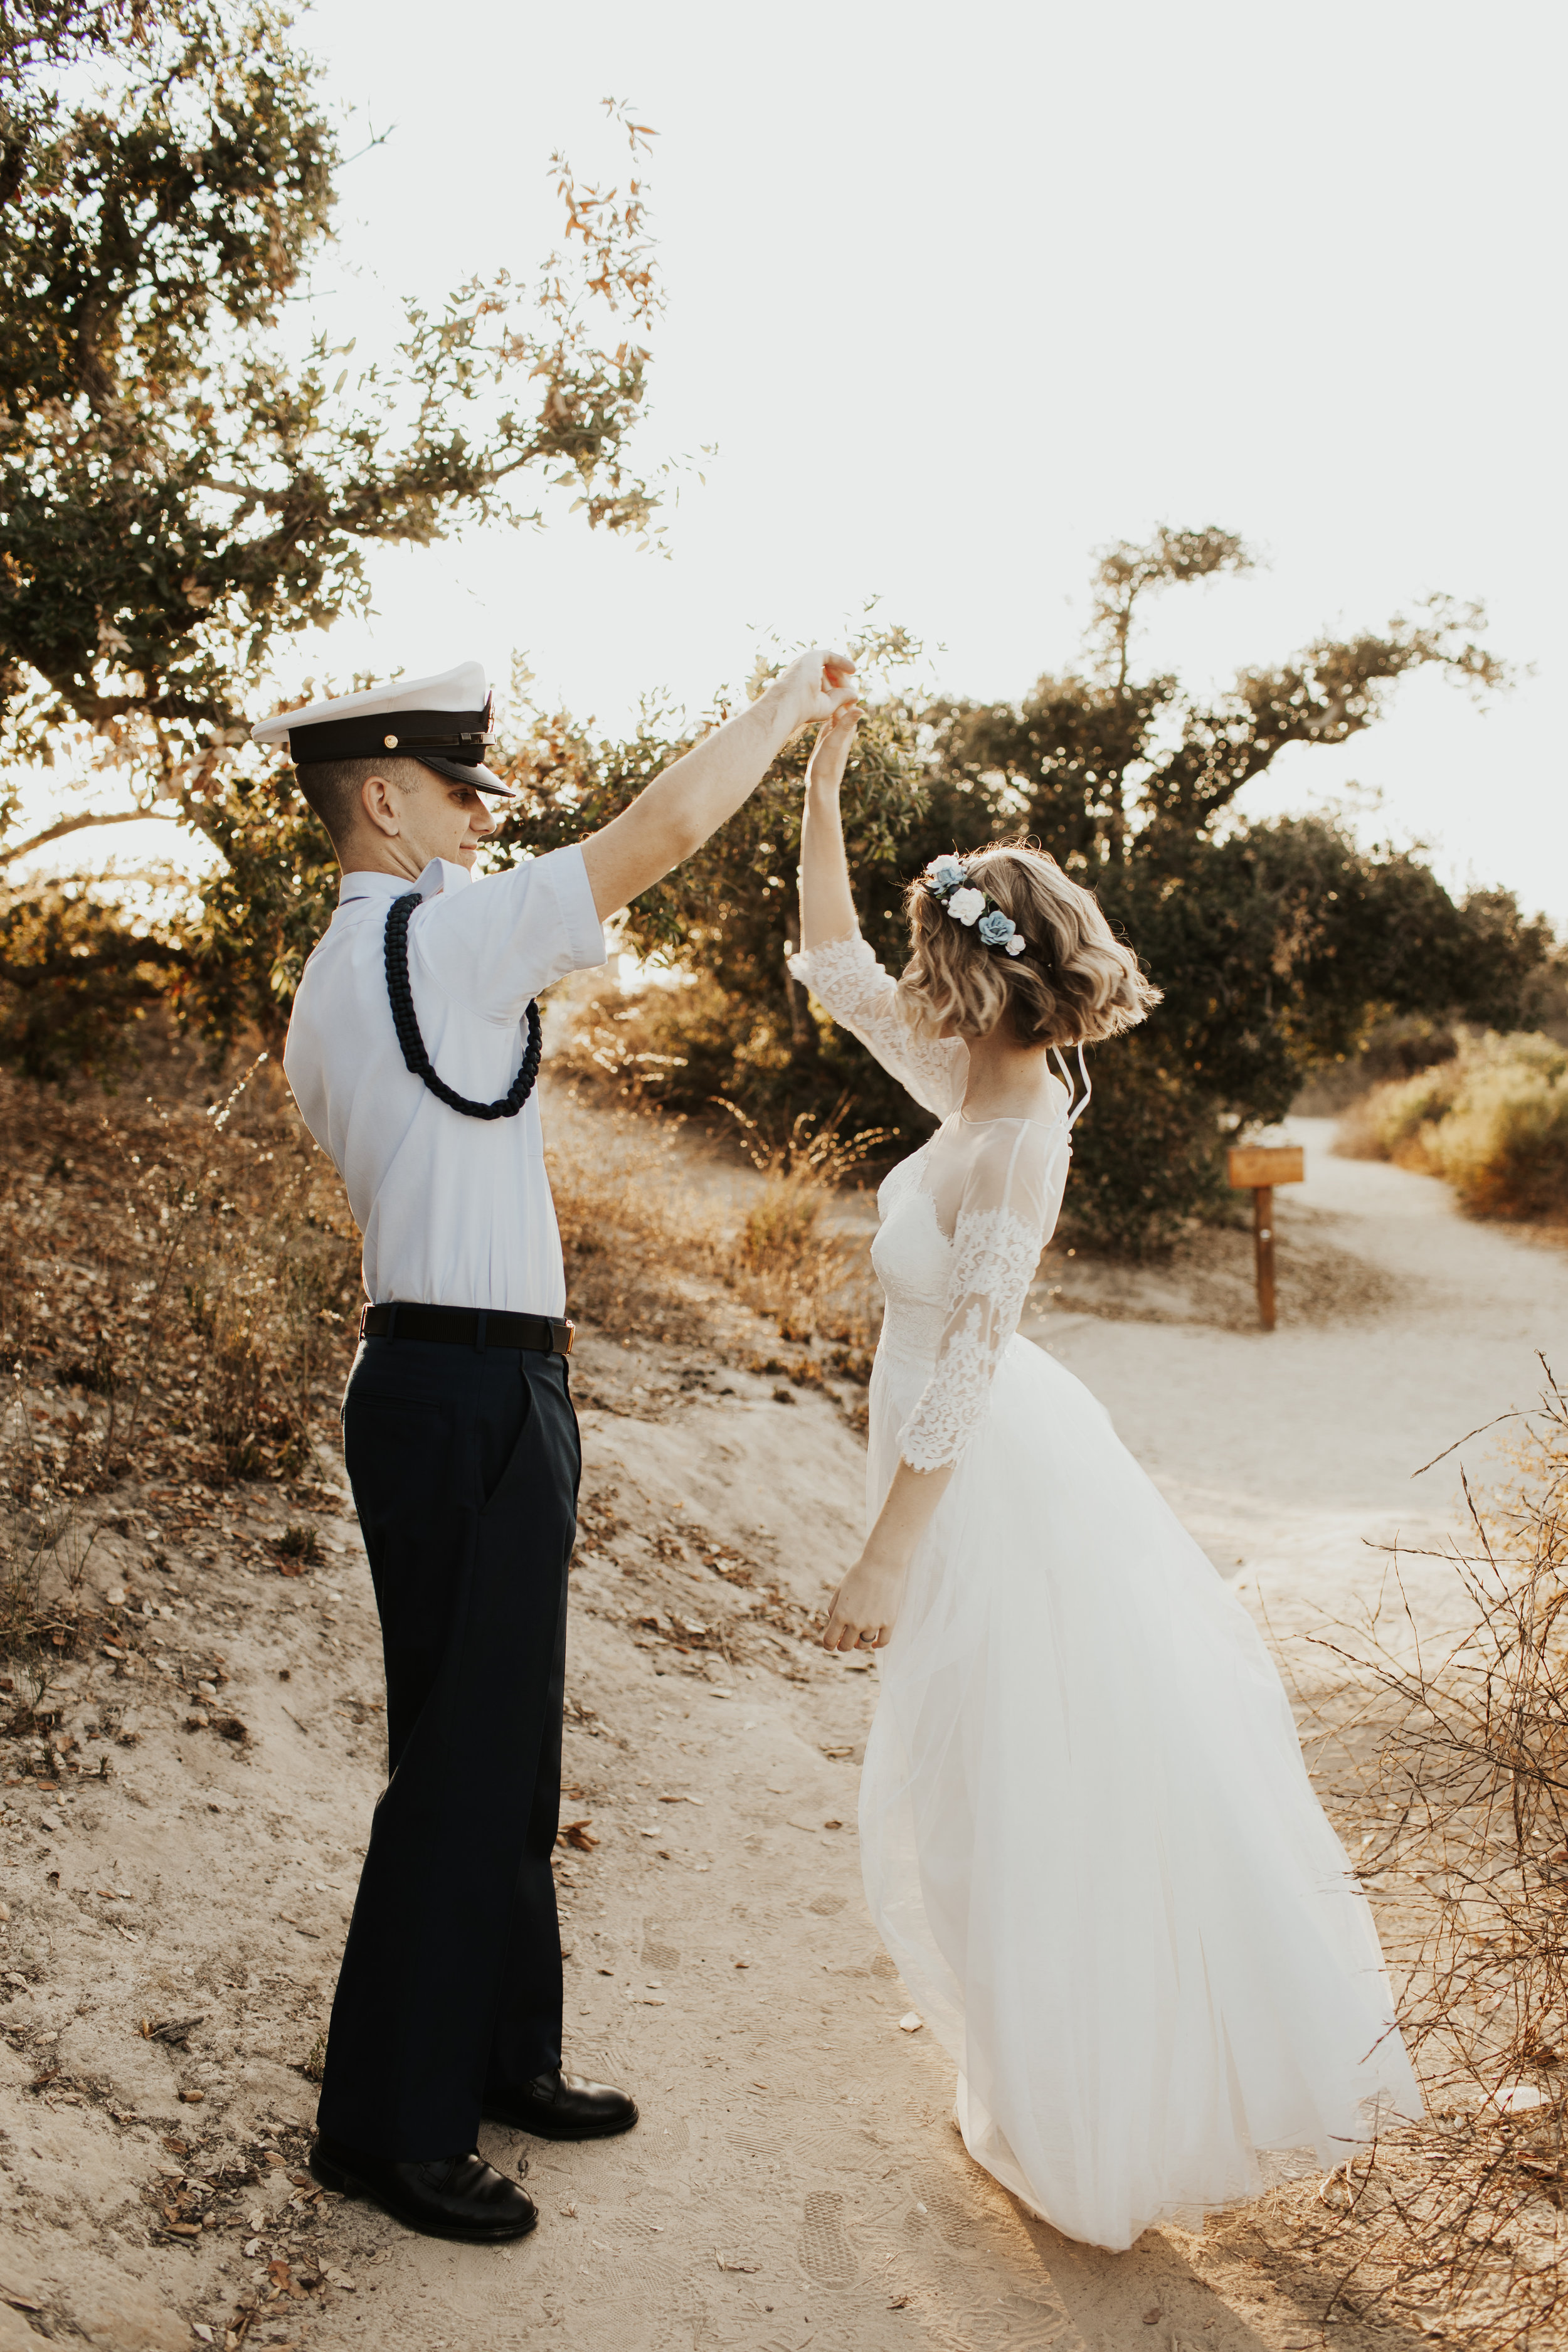 Jessie-Noah-Top-of-the-World-Laguna-Beach-Elopement-Bridal-Wedding-Session-FINISHED-13.jpg